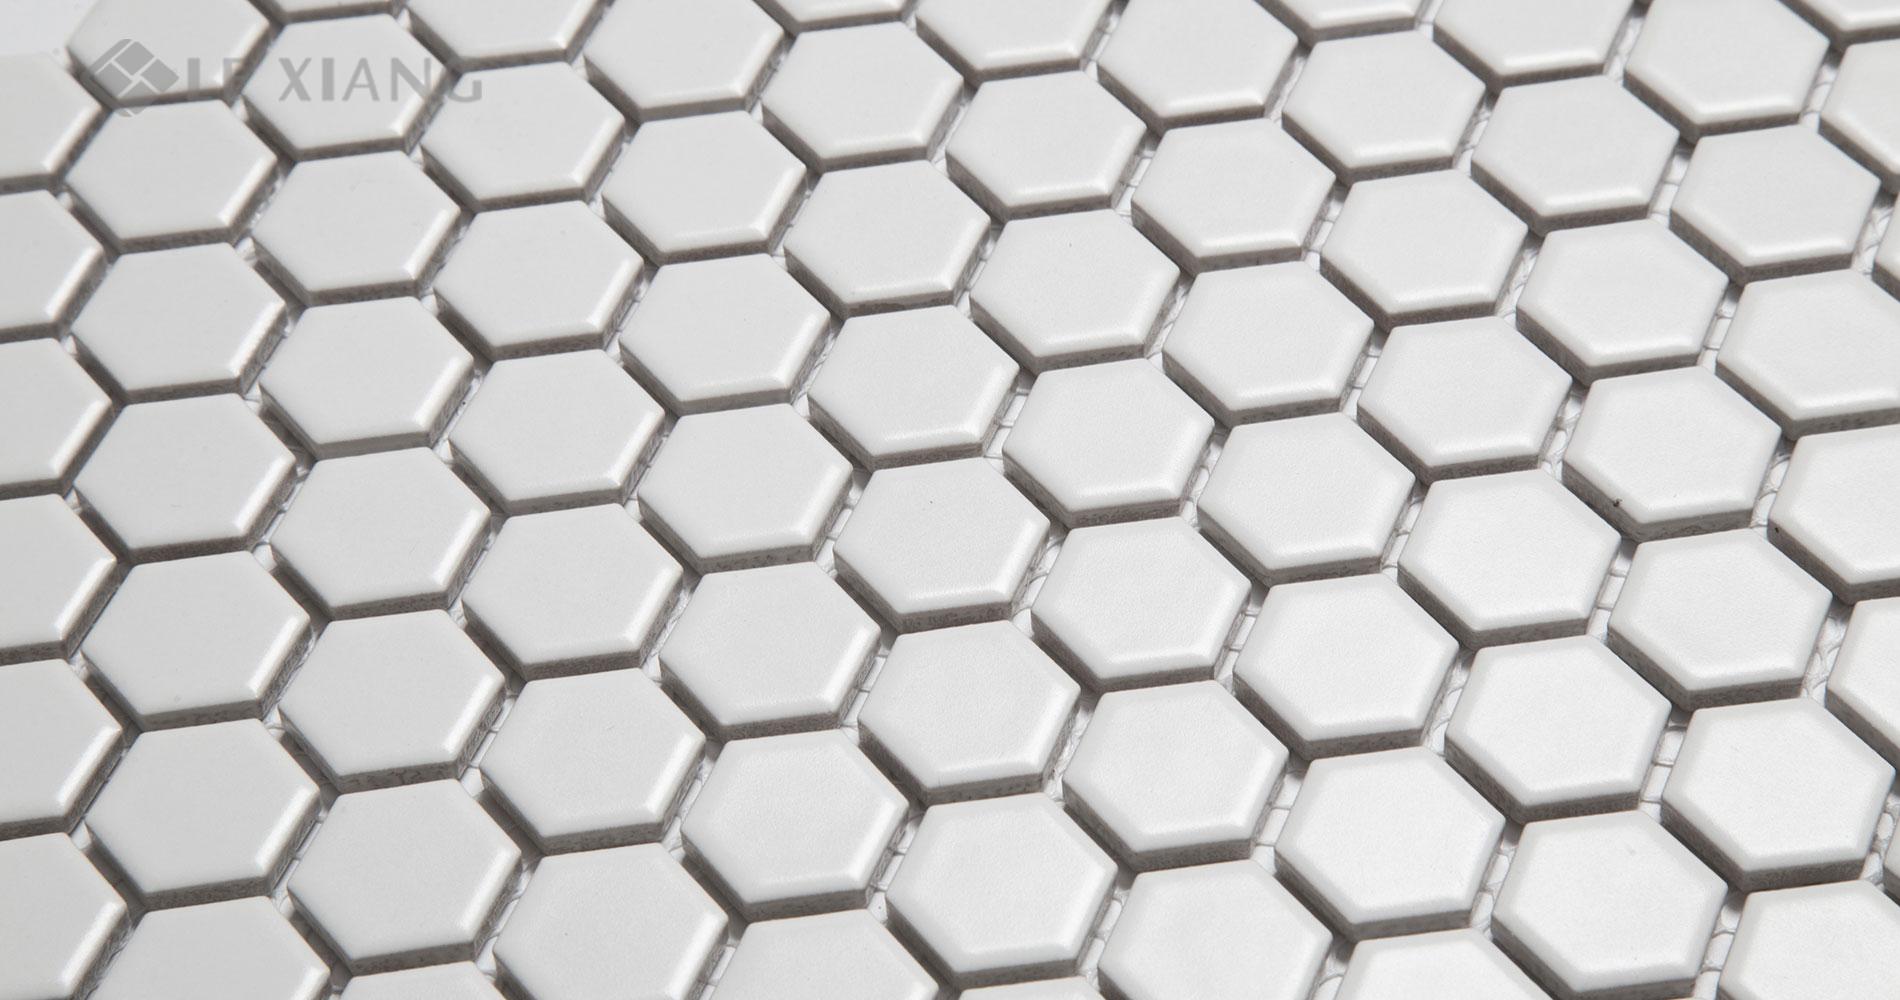 Porcelain-Hexagon-Mosaic-Tile-For-Bathroom-Wall-Flooring-Tiles-9